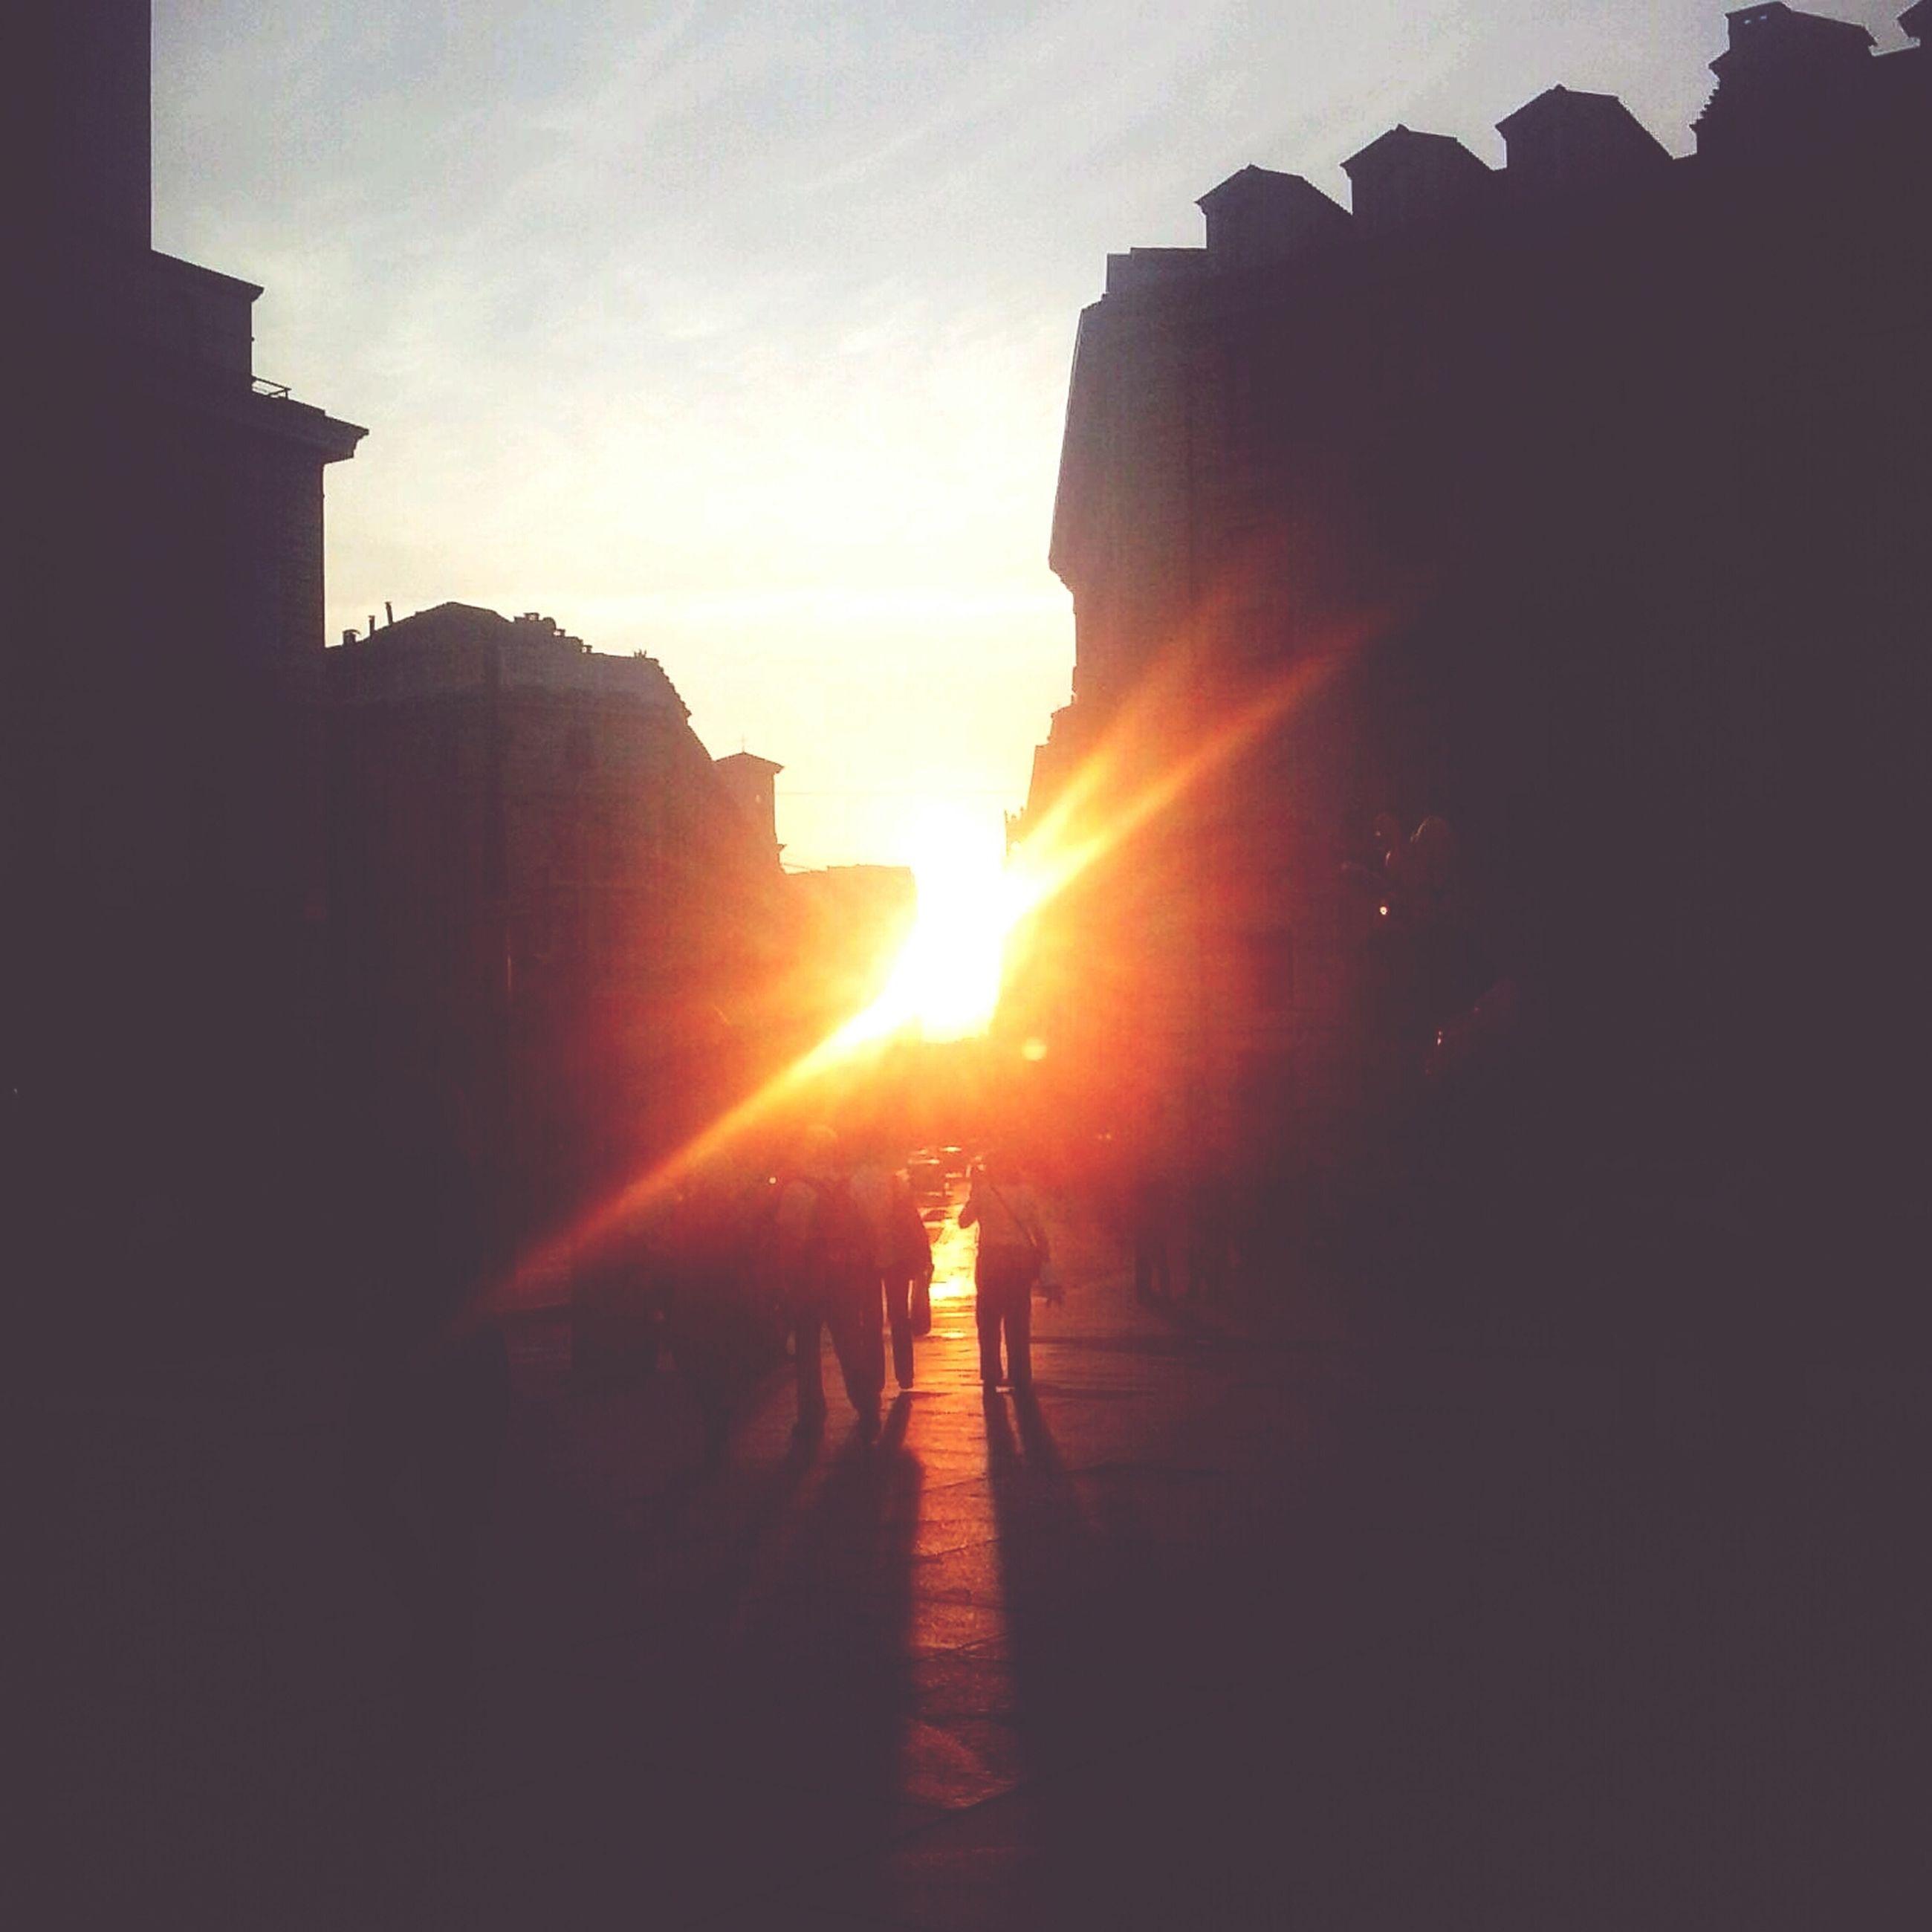 architecture, sunset, built structure, building exterior, silhouette, sun, sunlight, sky, the way forward, sunbeam, city, building, lens flare, orange color, outdoors, walking, unrecognizable person, men, railing